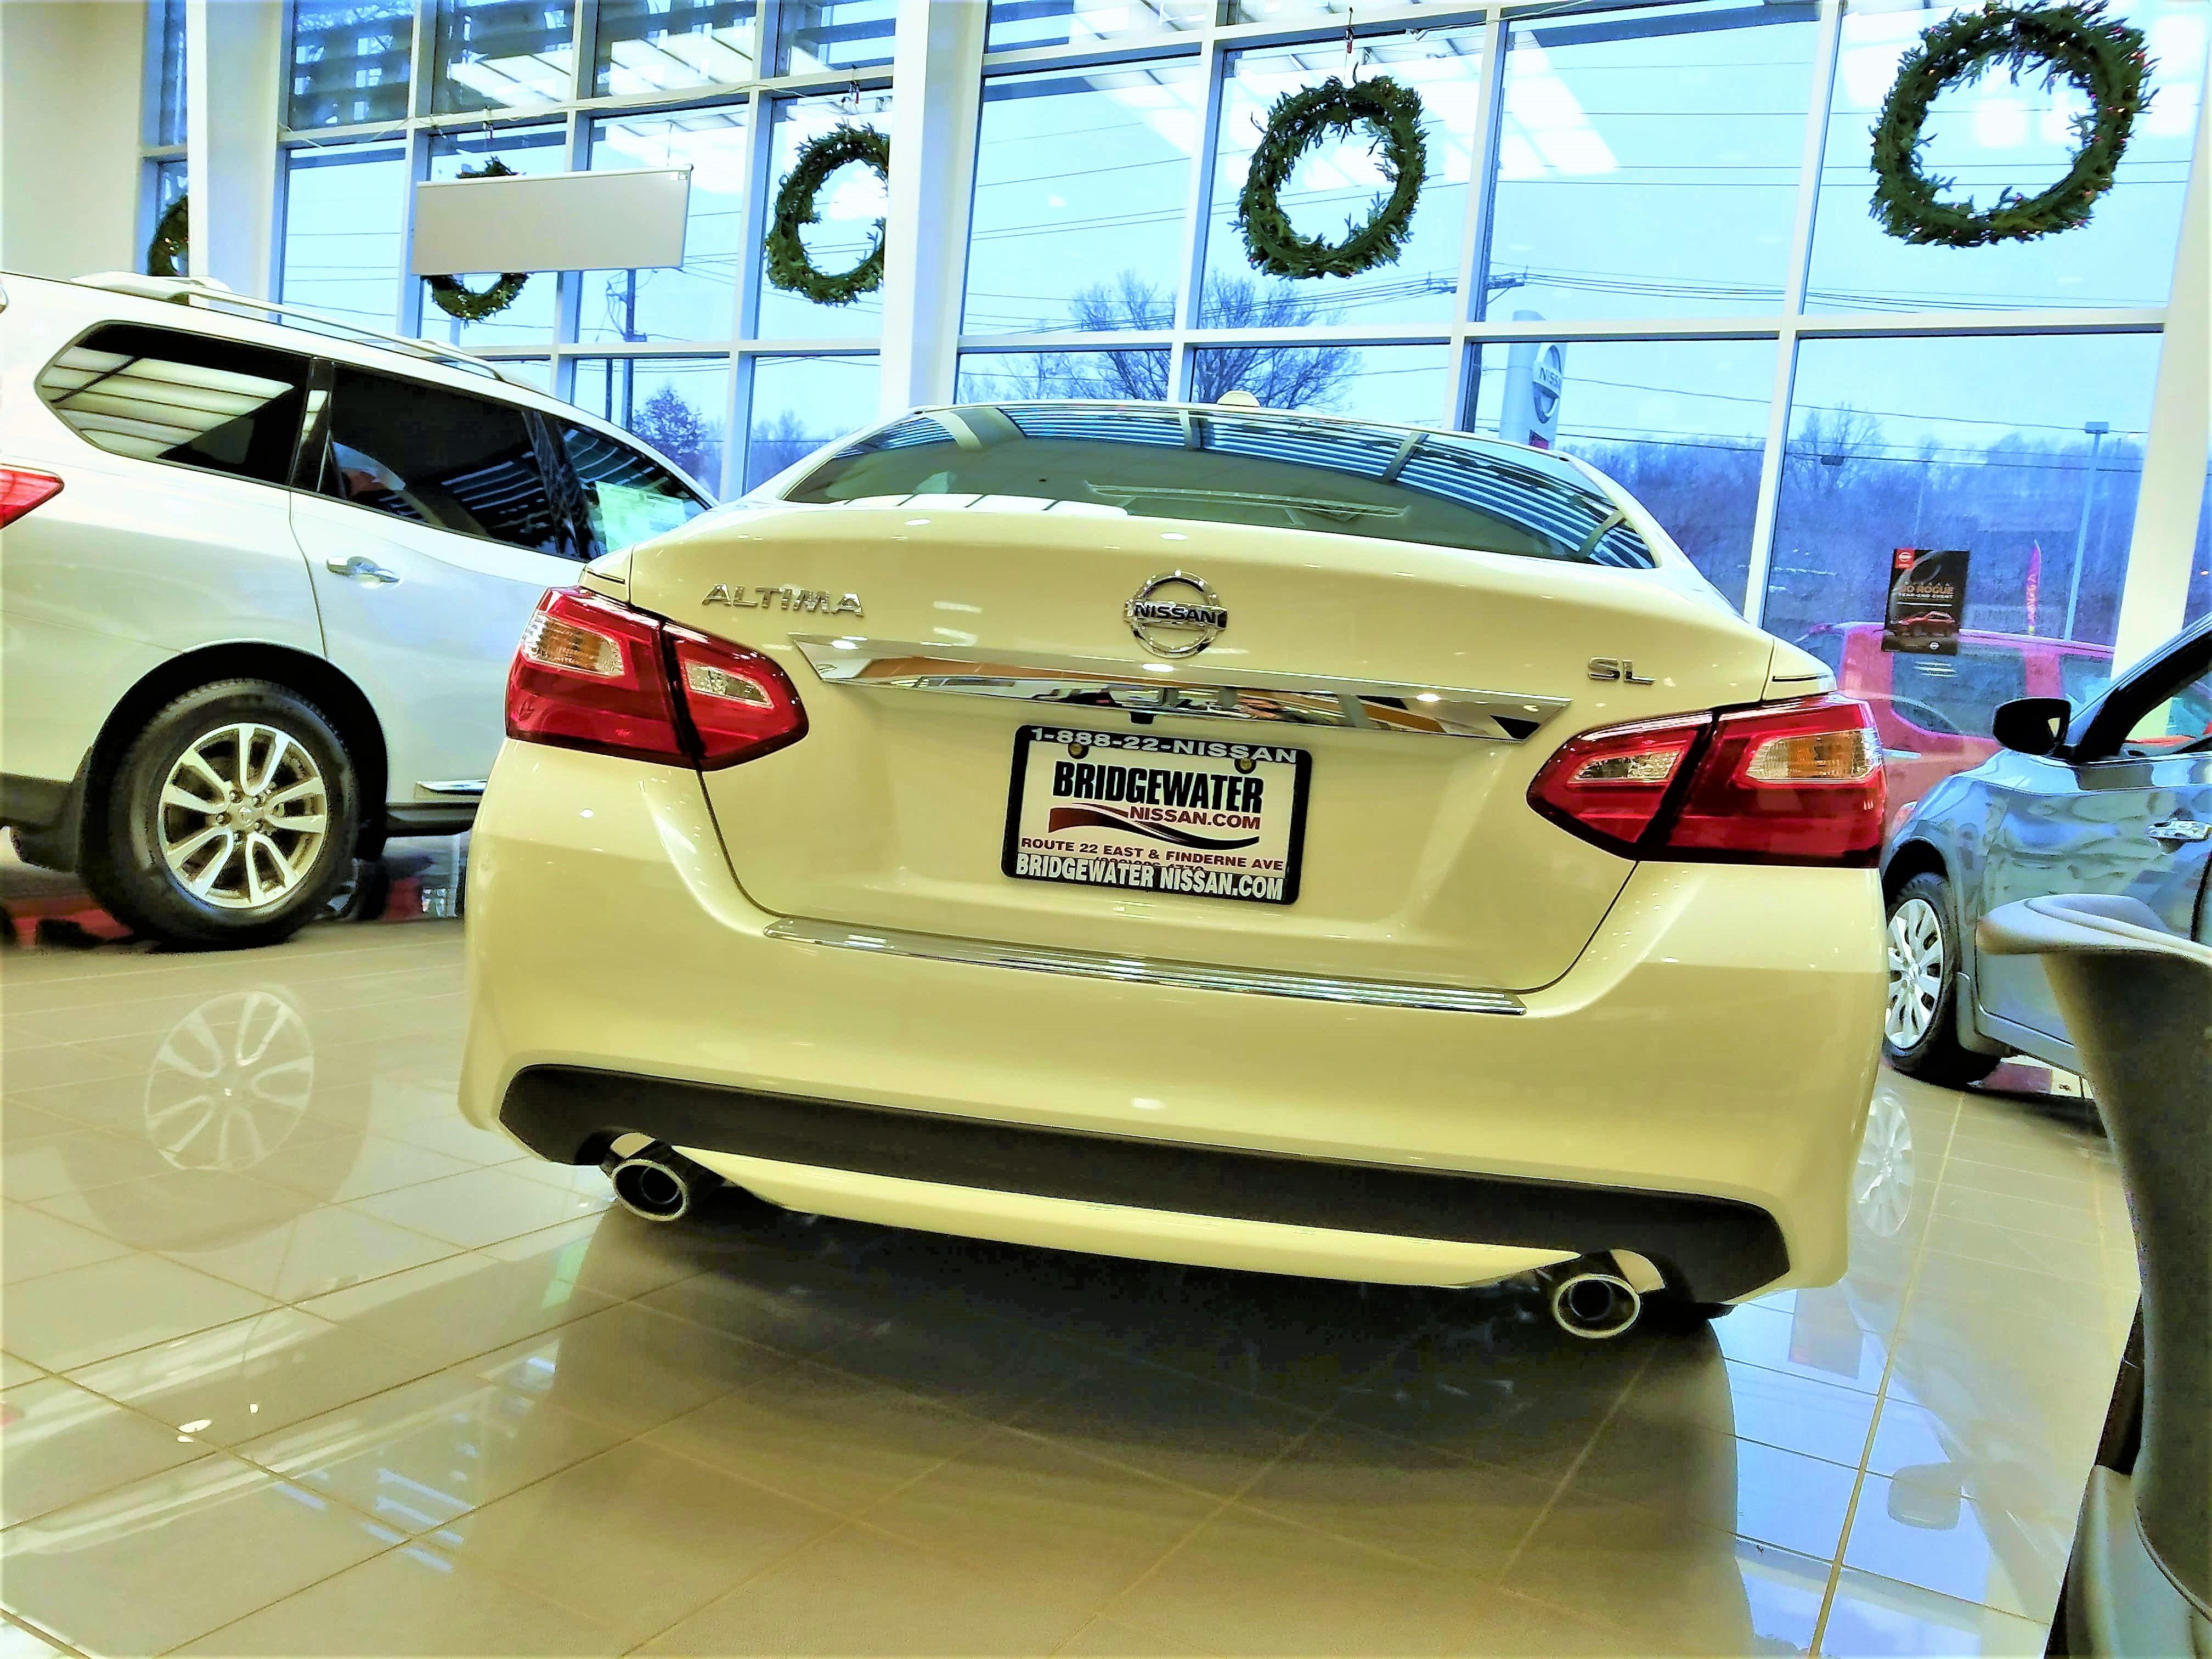 2016 Nissan Altima Nissan Datsun PakWheels Forums